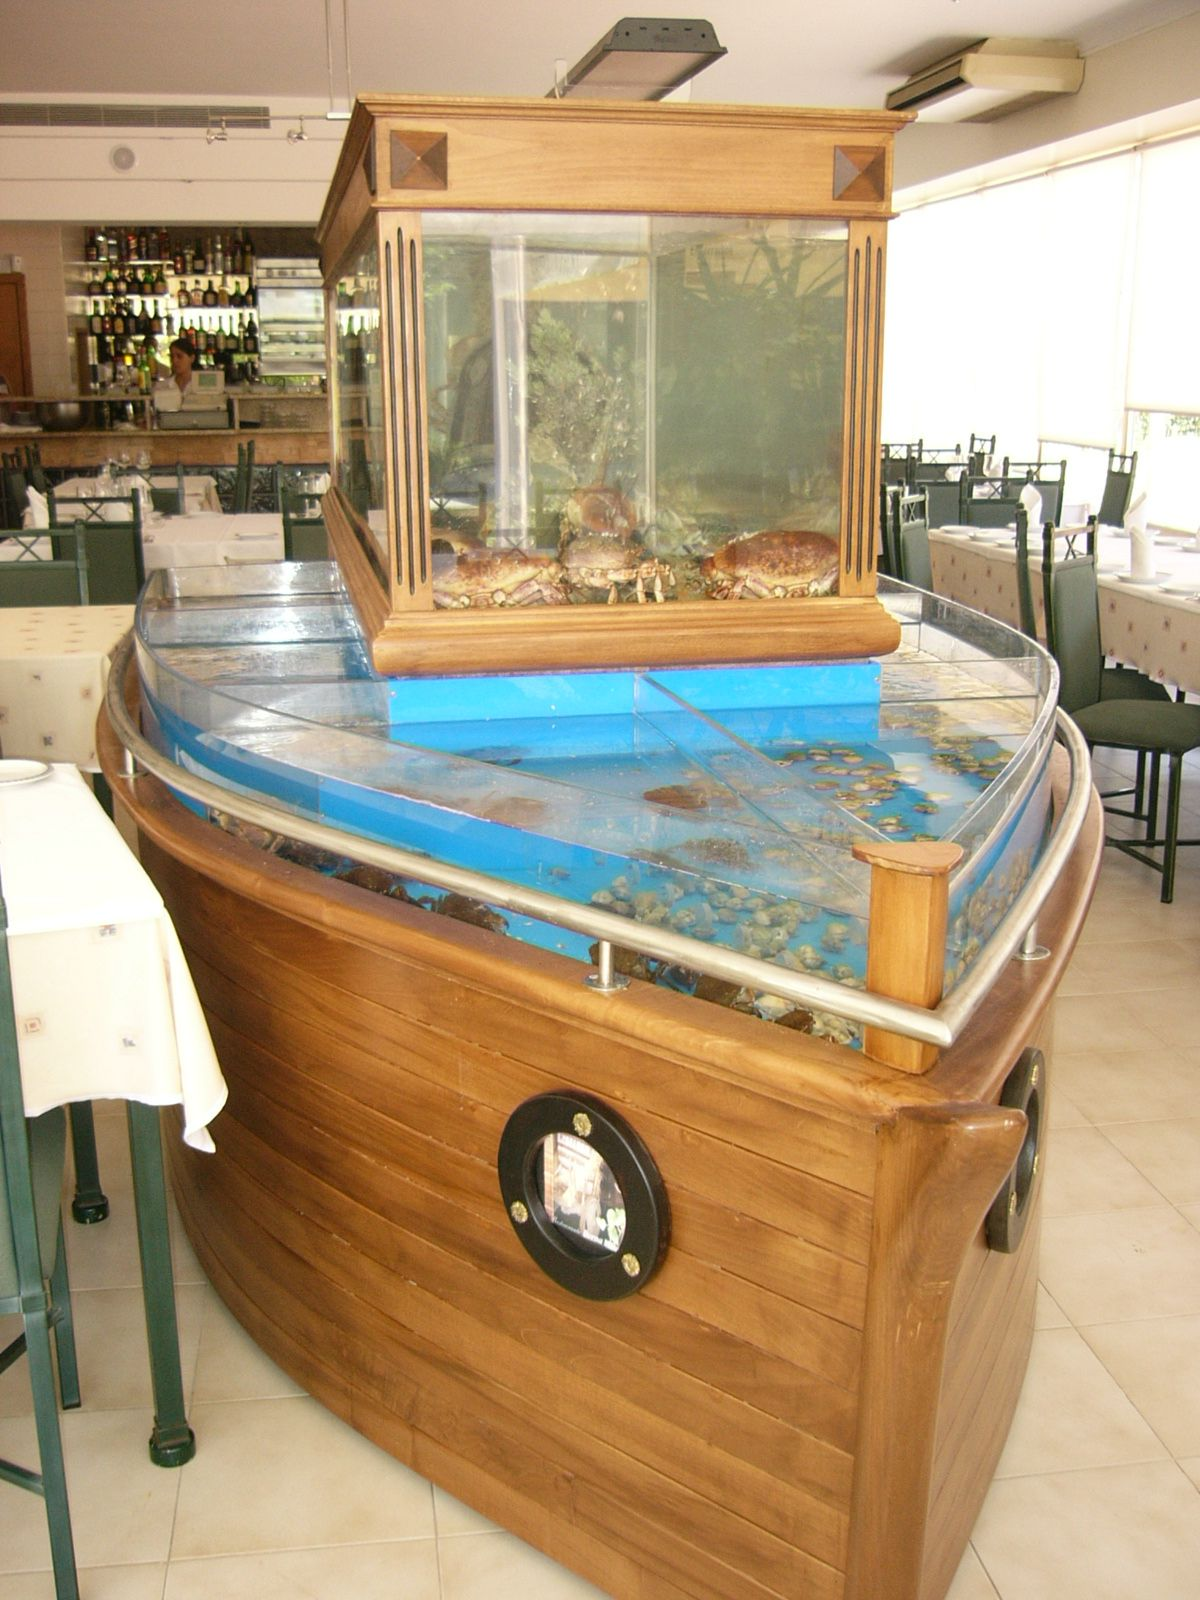 Man Cave Show Tank : Images about fishtanks on pinterest fish tanks